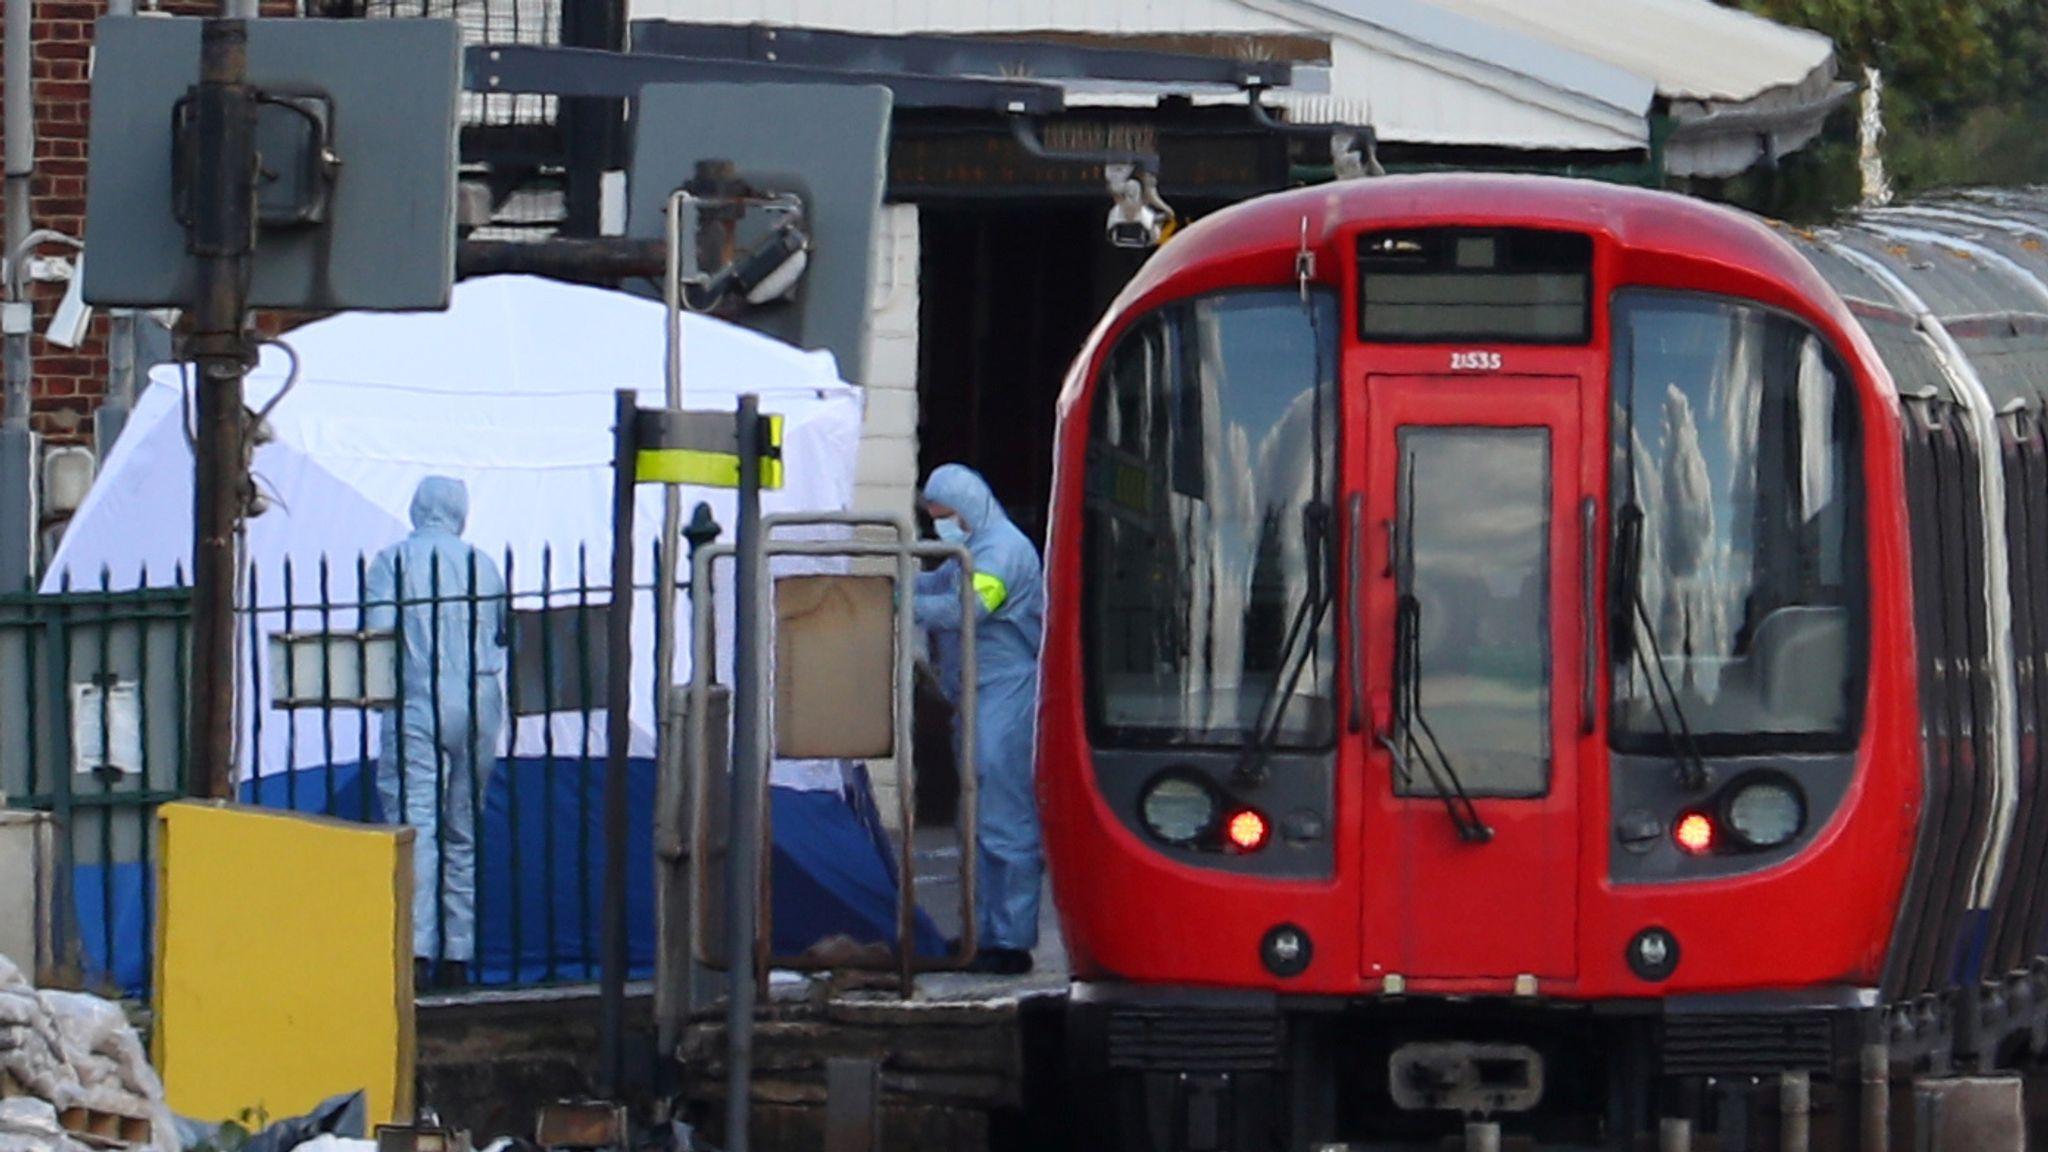 Recap: Parsons Green Tube bomb victims describe 'fireball